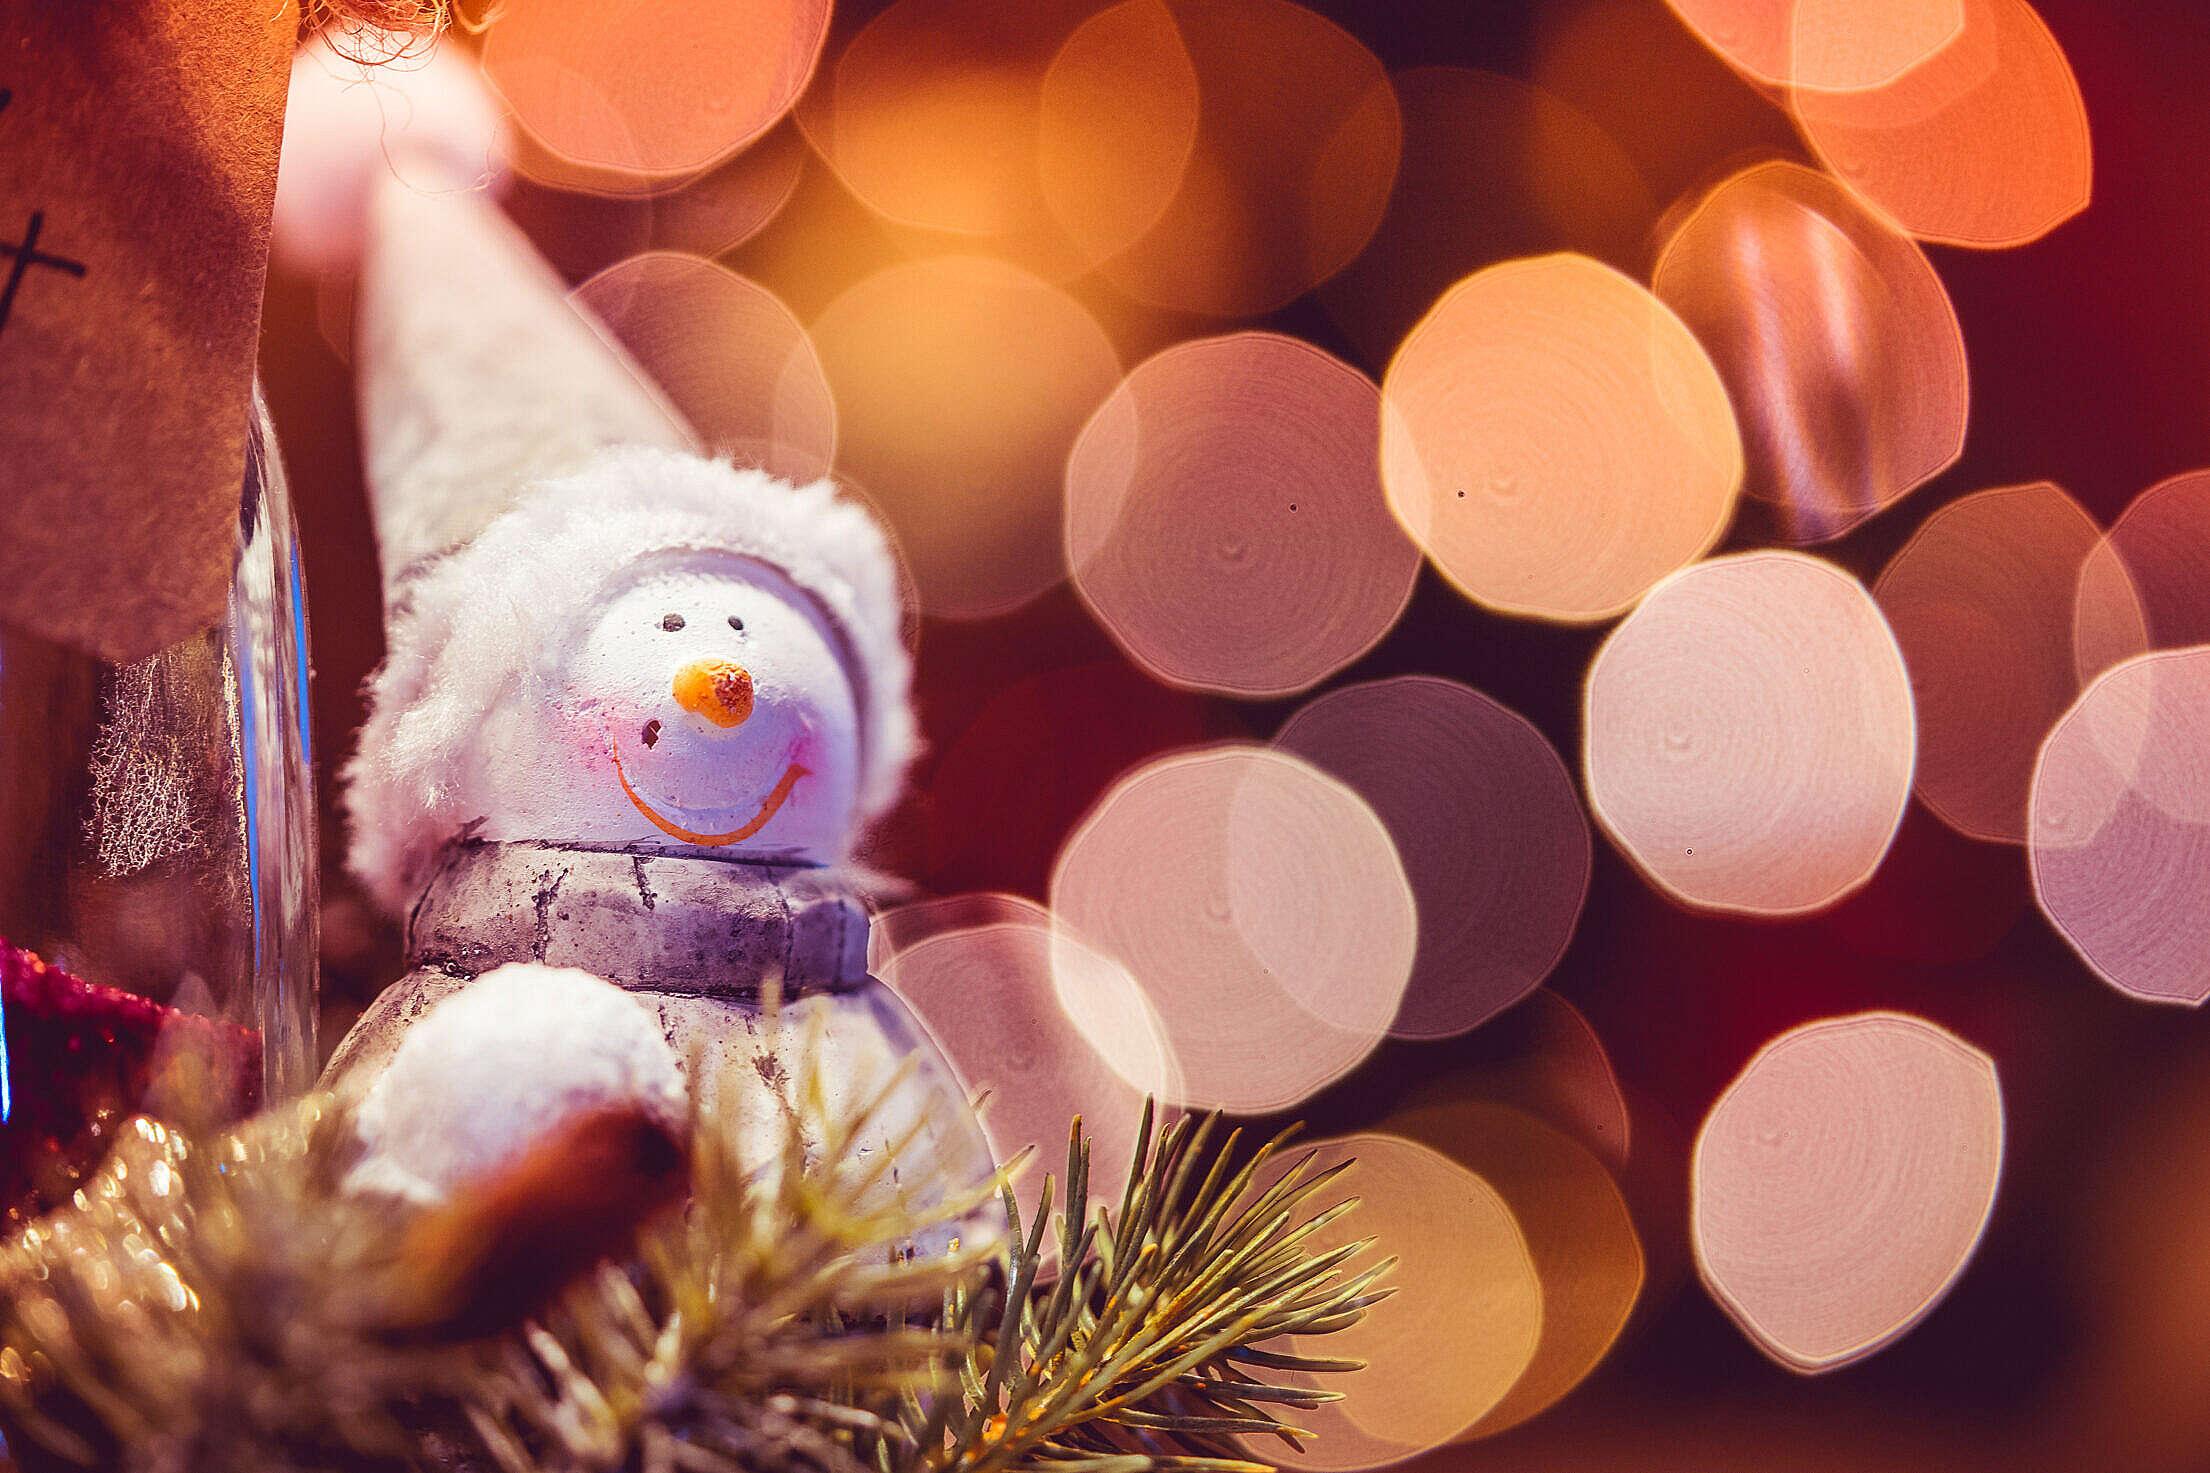 Snowman Decoration with Christmas Bokeh Free Stock Photo